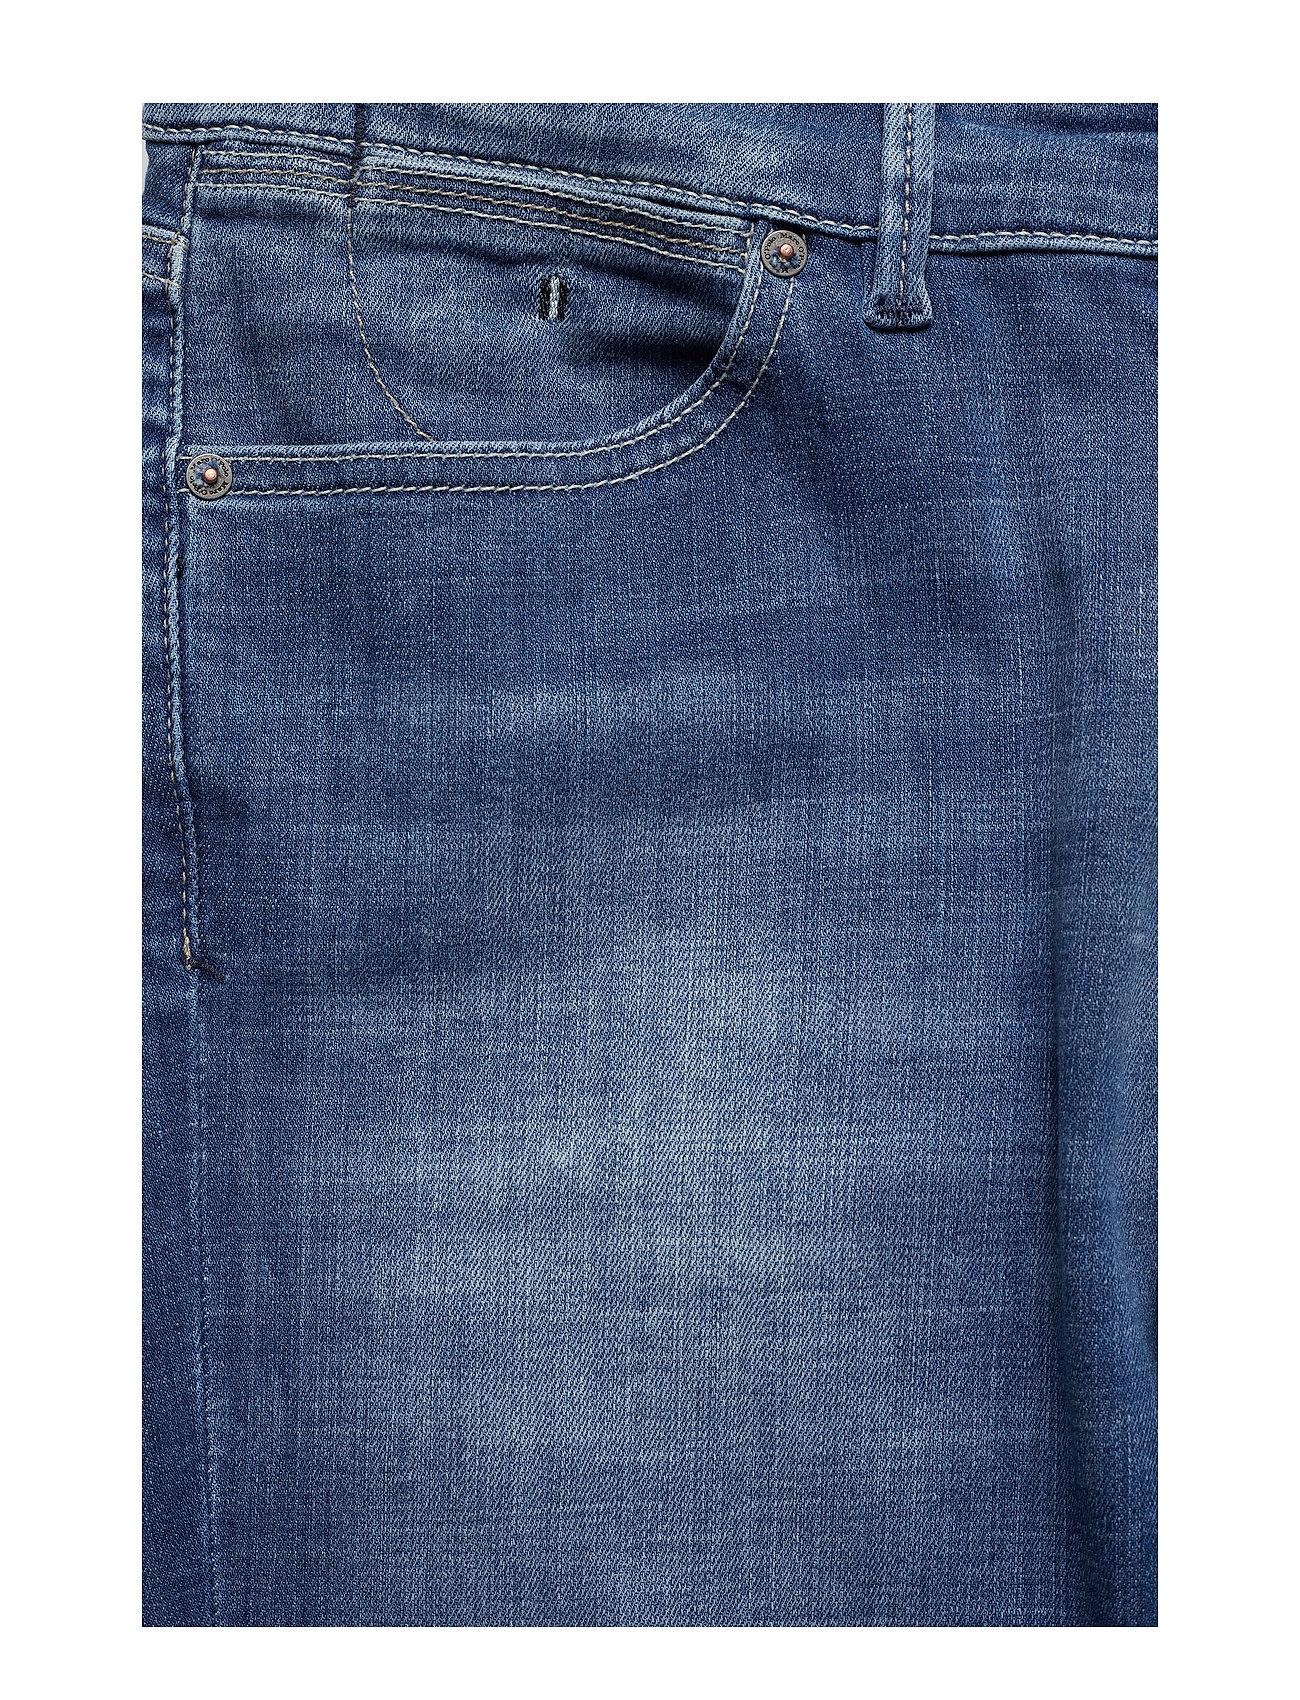 Trousersplay Blue WashMarc O'polo Denim With NvmwOn80